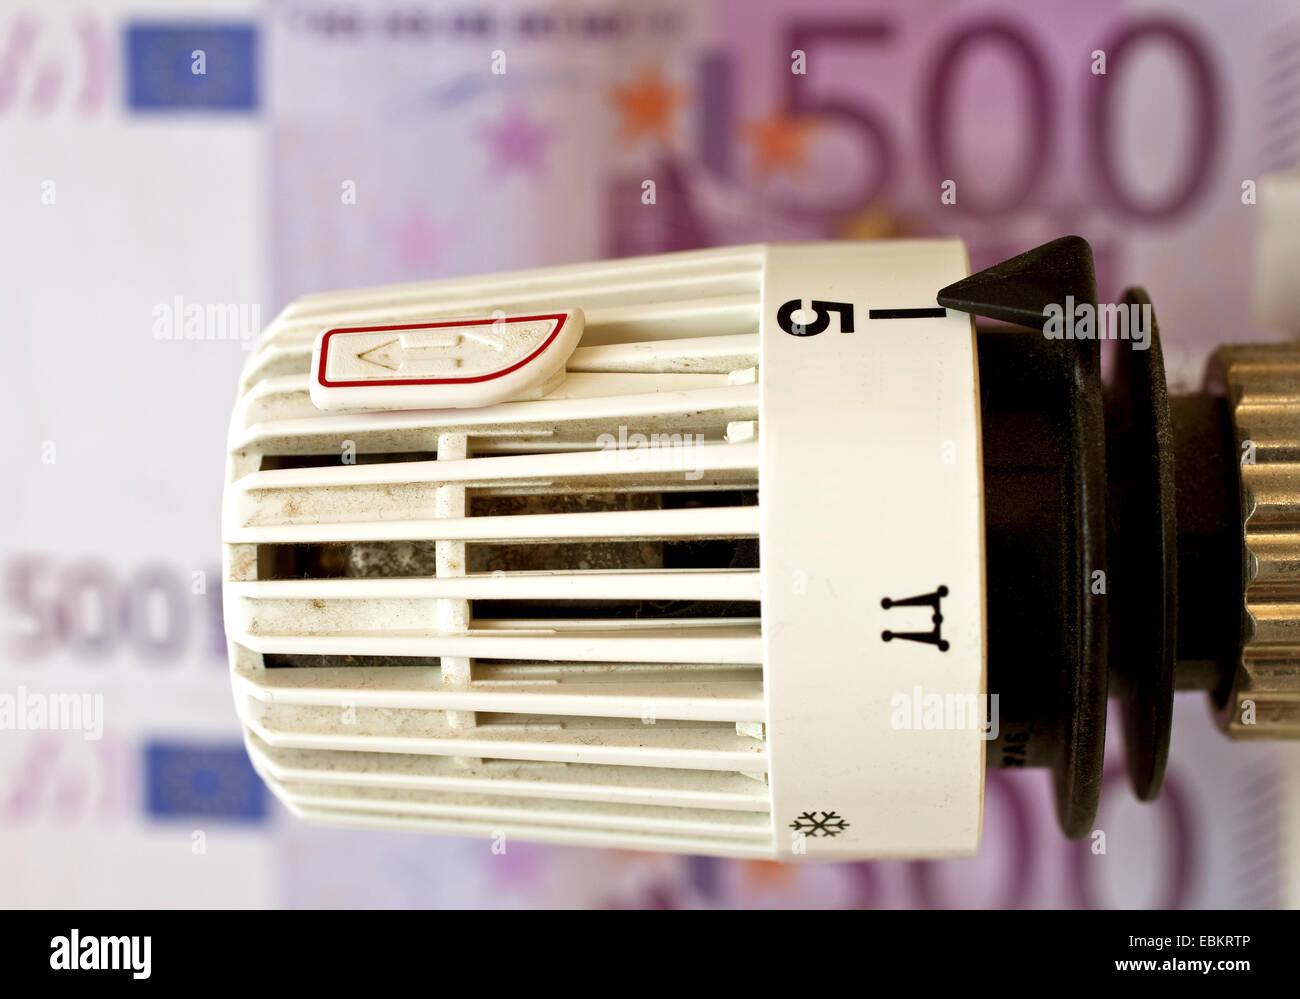 heating thermostat and Euro bills, heating coasts symbol, Germany - Stock Image